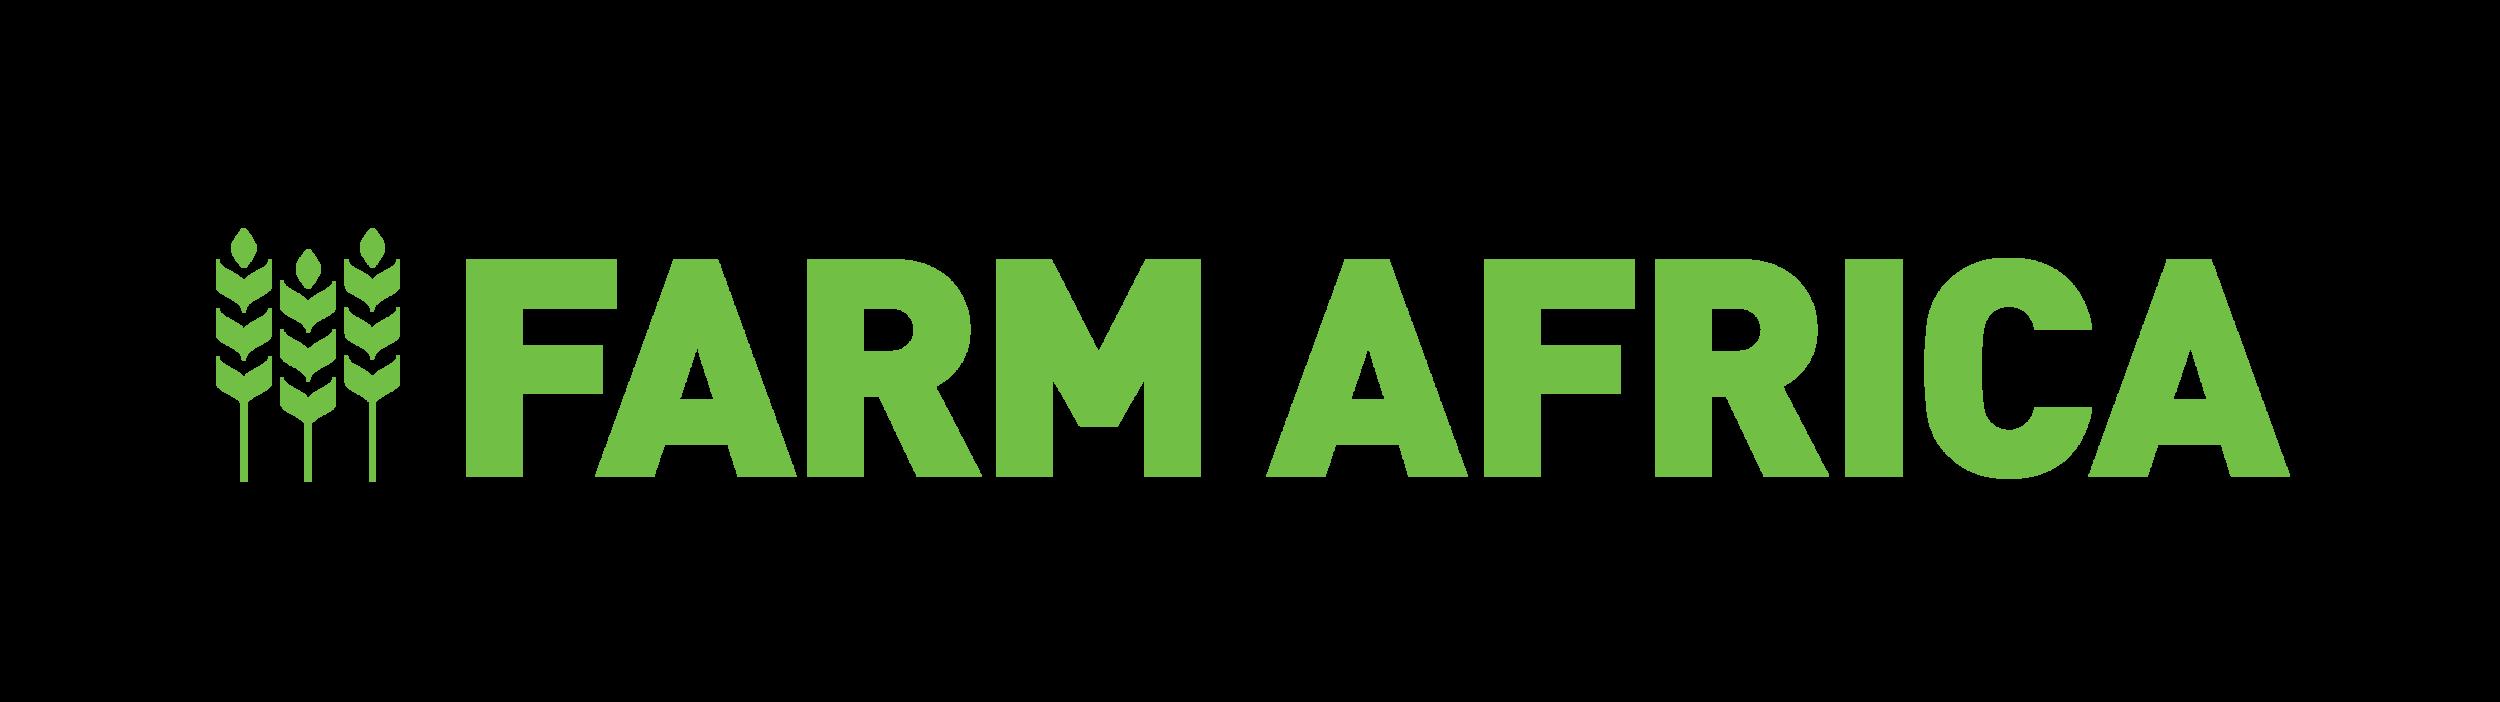 Farm Africa logo-green.png